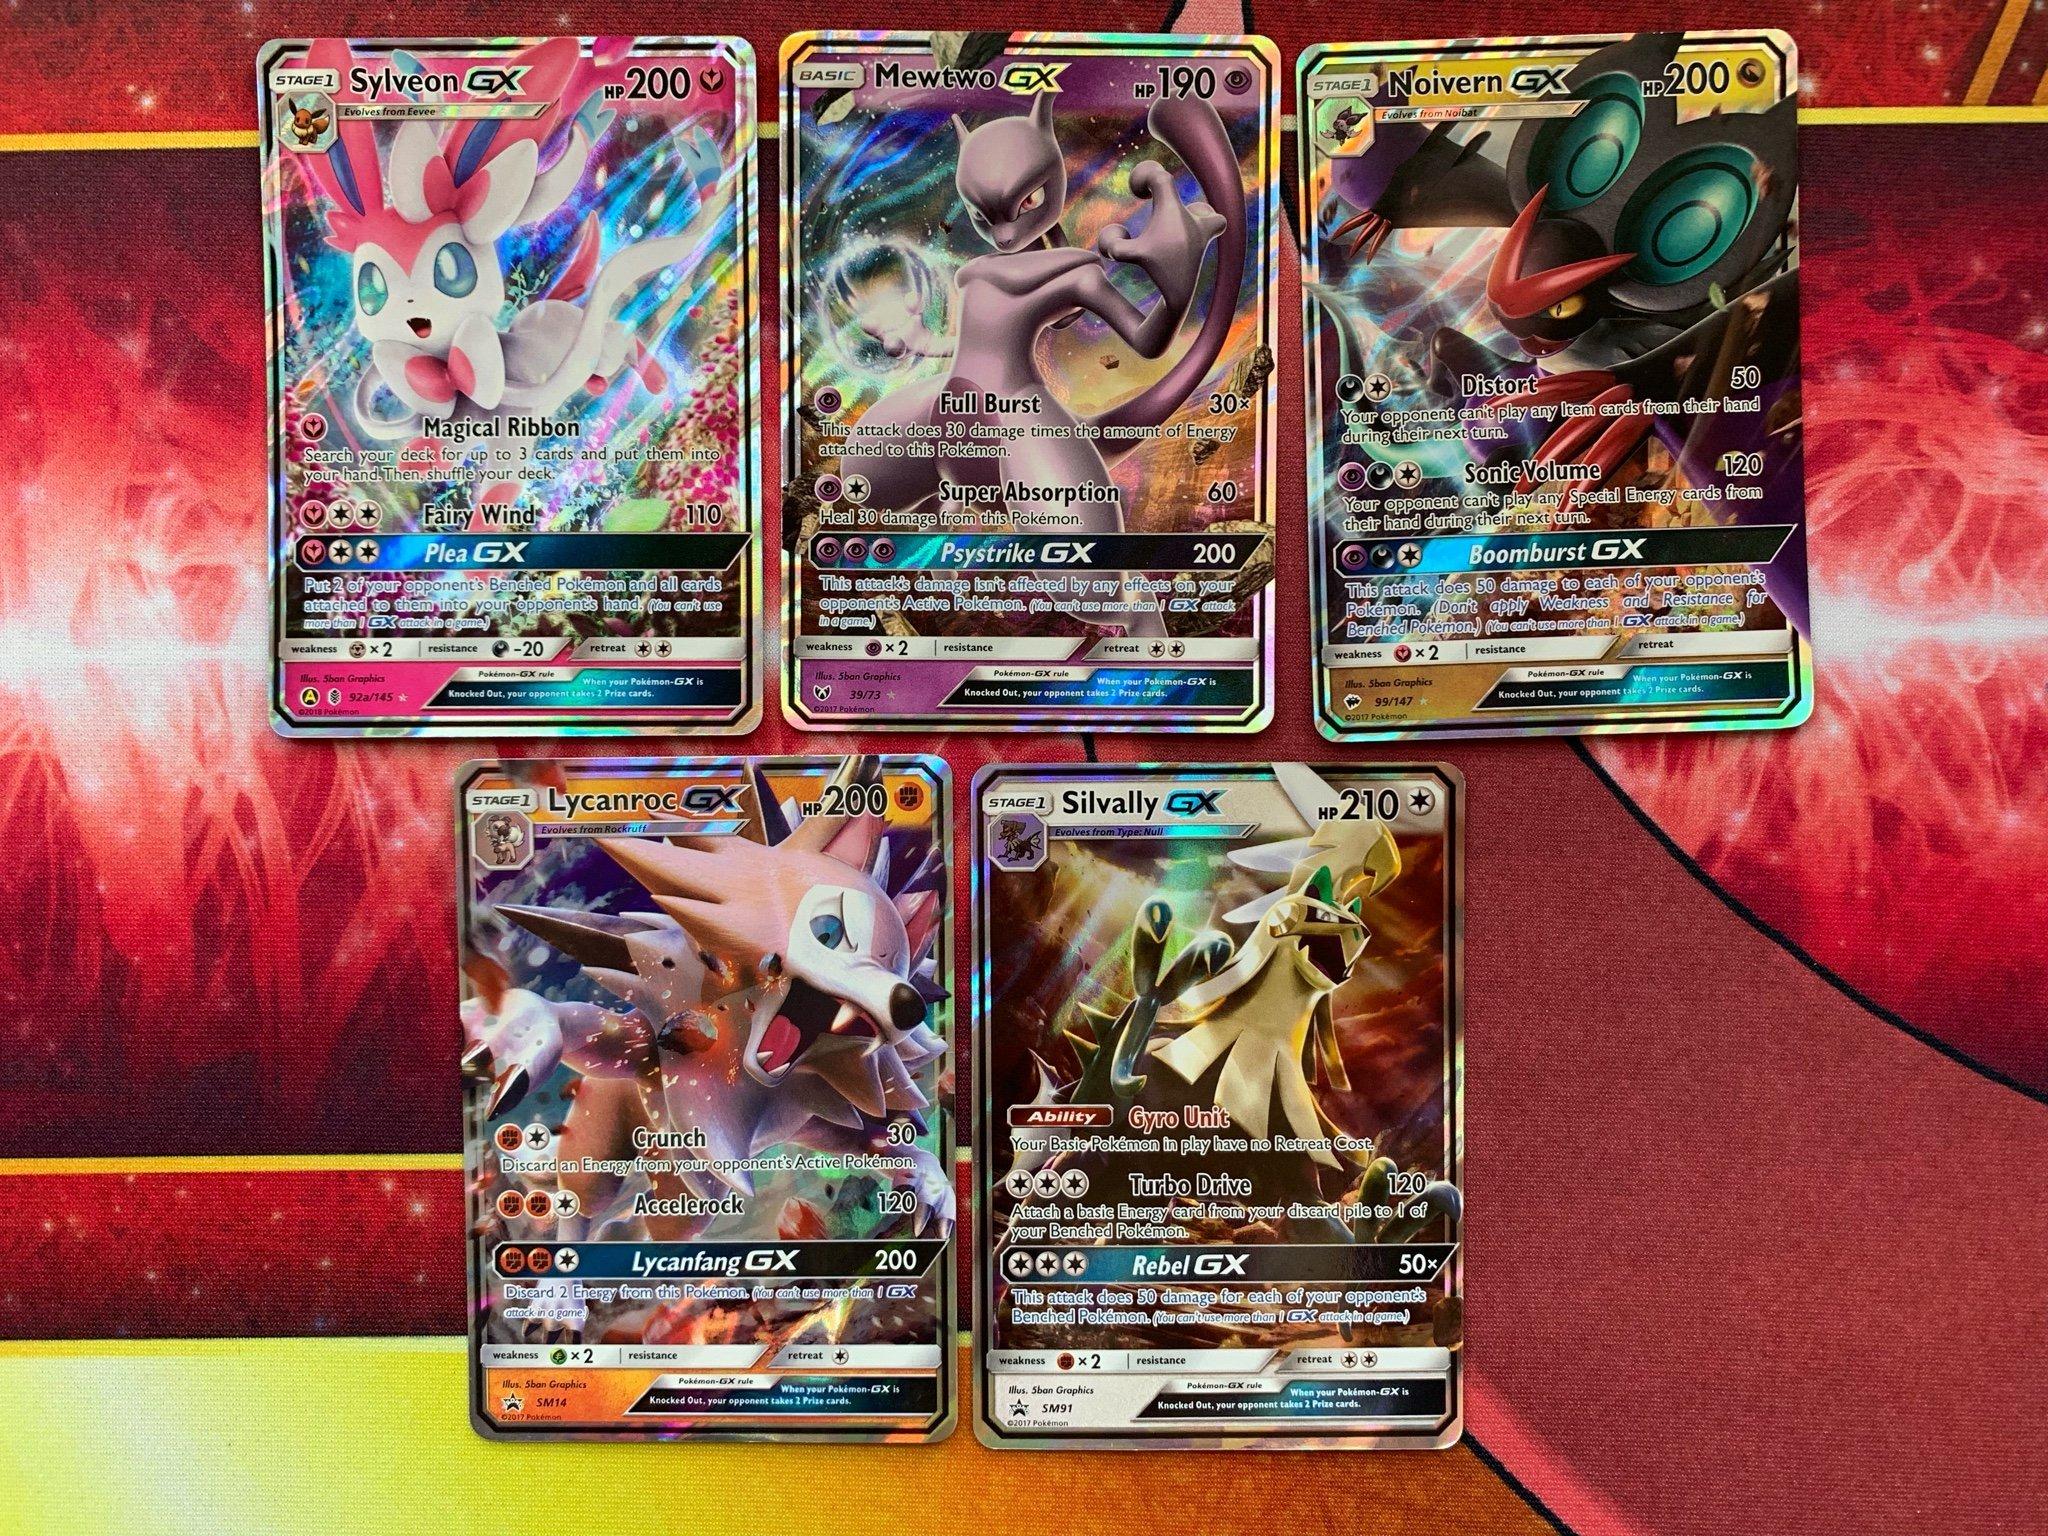 Utforsaljning Av Gx Kort Pokemonkort Pokemon Kort 380505551 ᐈ